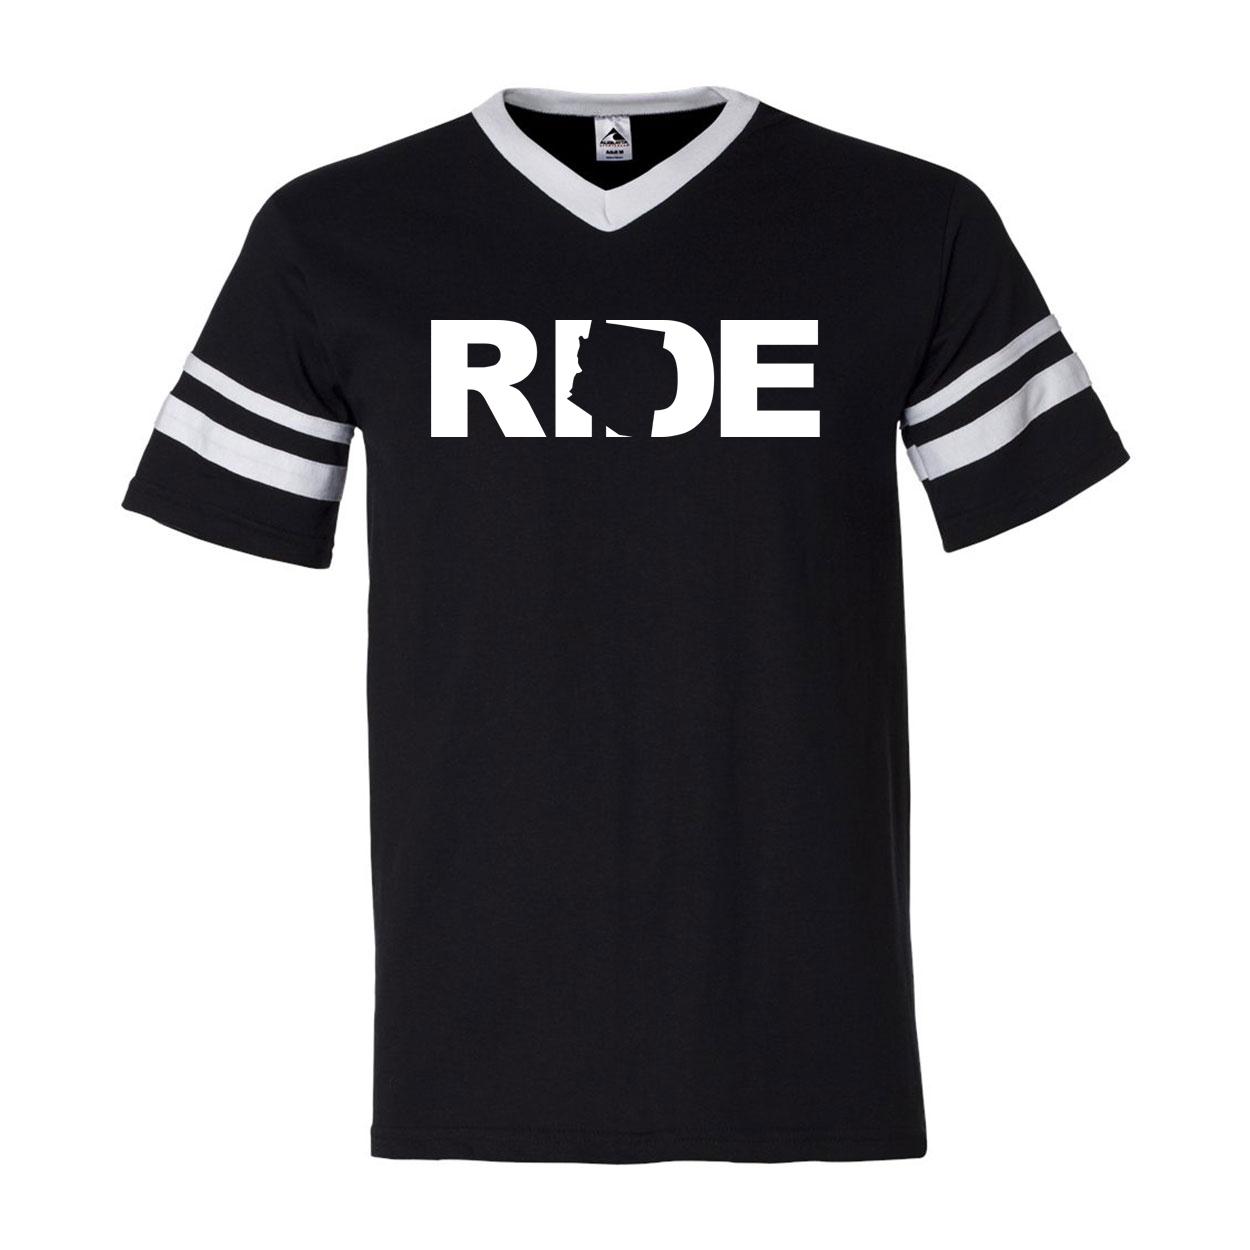 Ride Arizona Classic Premium Striped Jersey T-Shirt Black/White (White Logo)